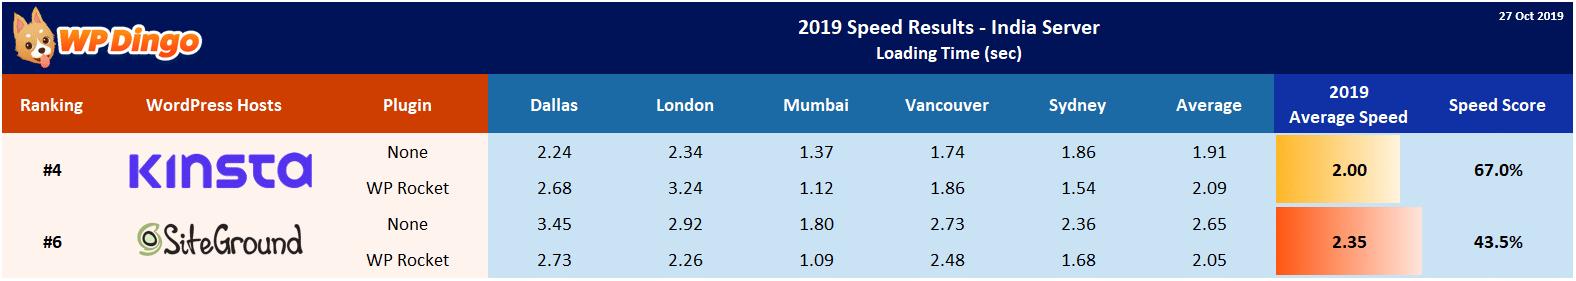 2019 Kinsta vs SiteGround Speed Table - India Server